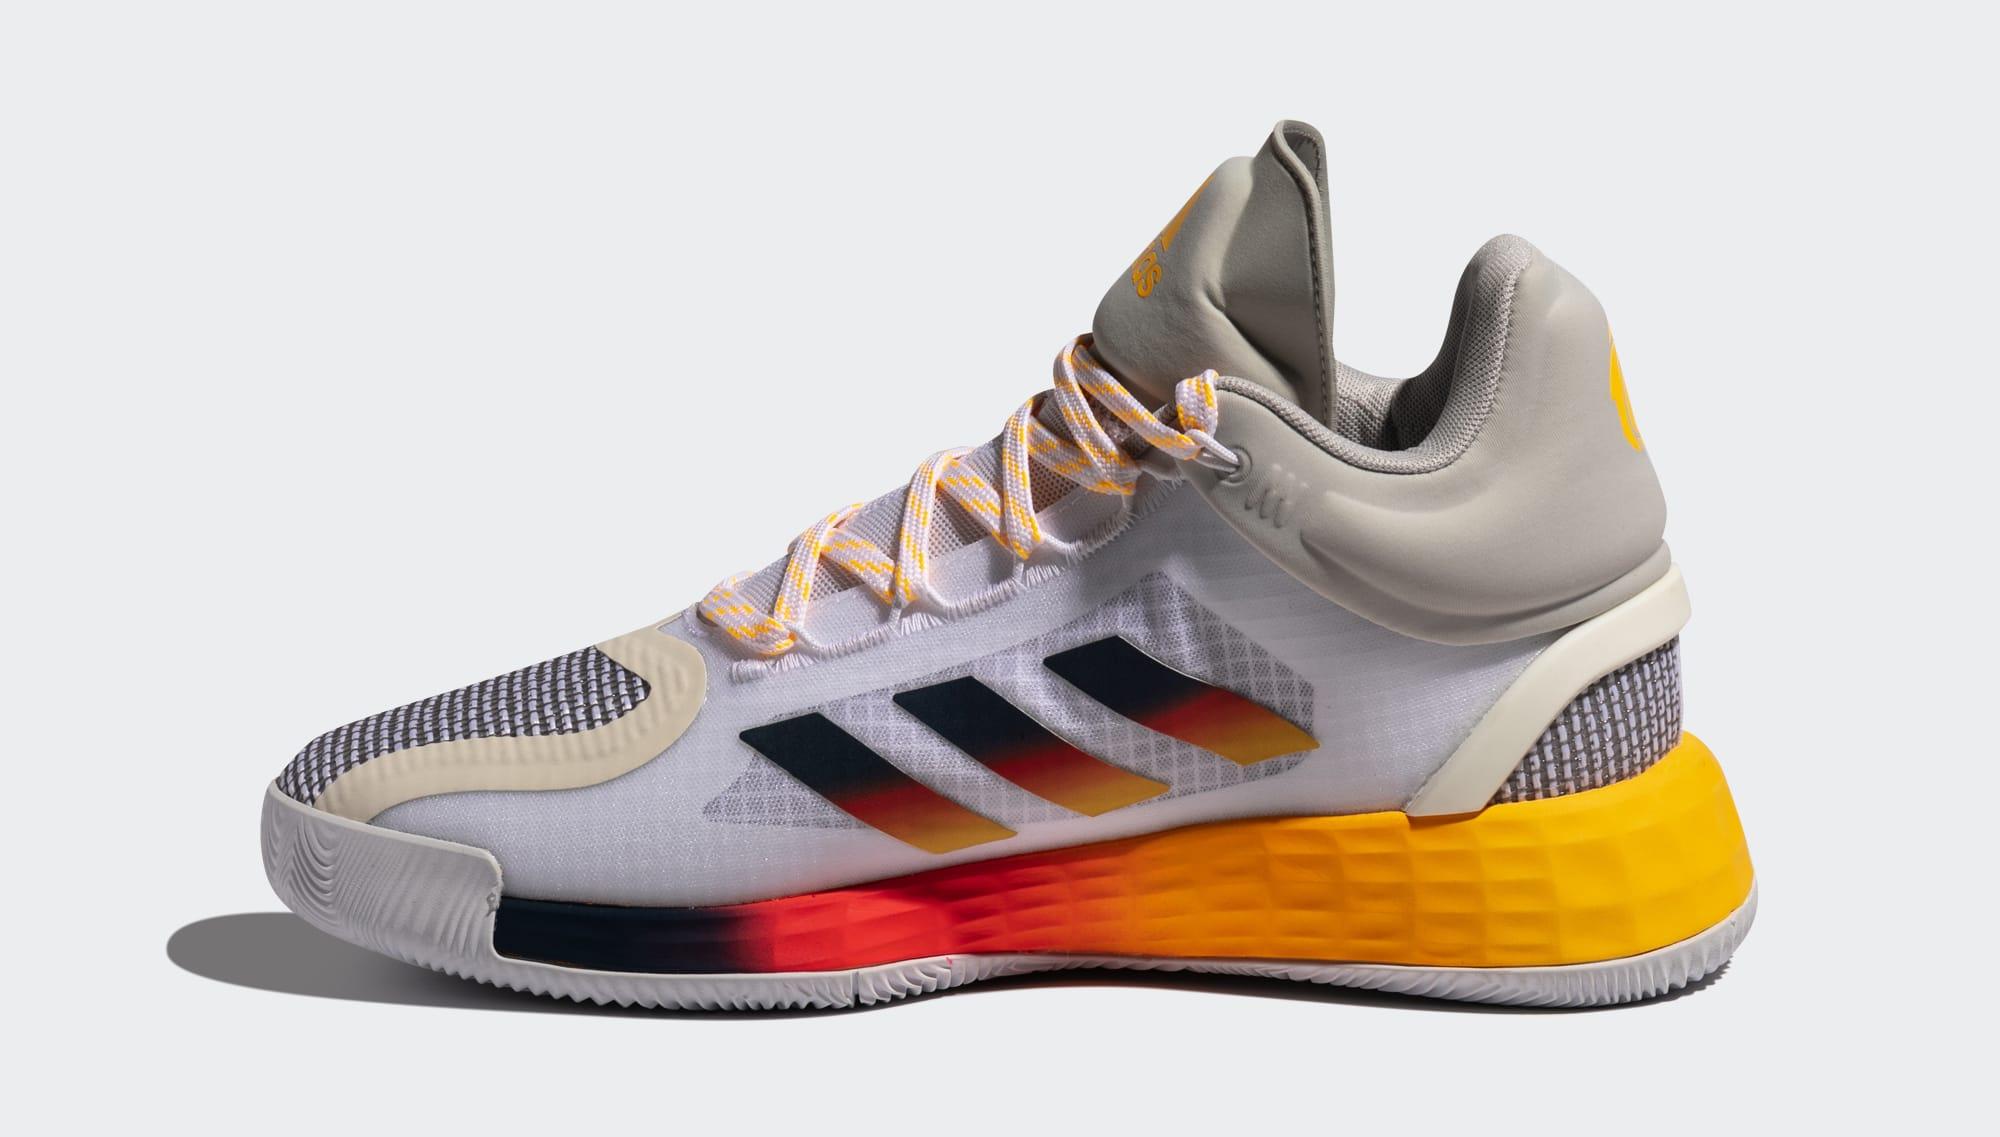 Adidas D Rose 11 'Ftwr White/Solar Gold/Tech Indigo' FW8508 Medial